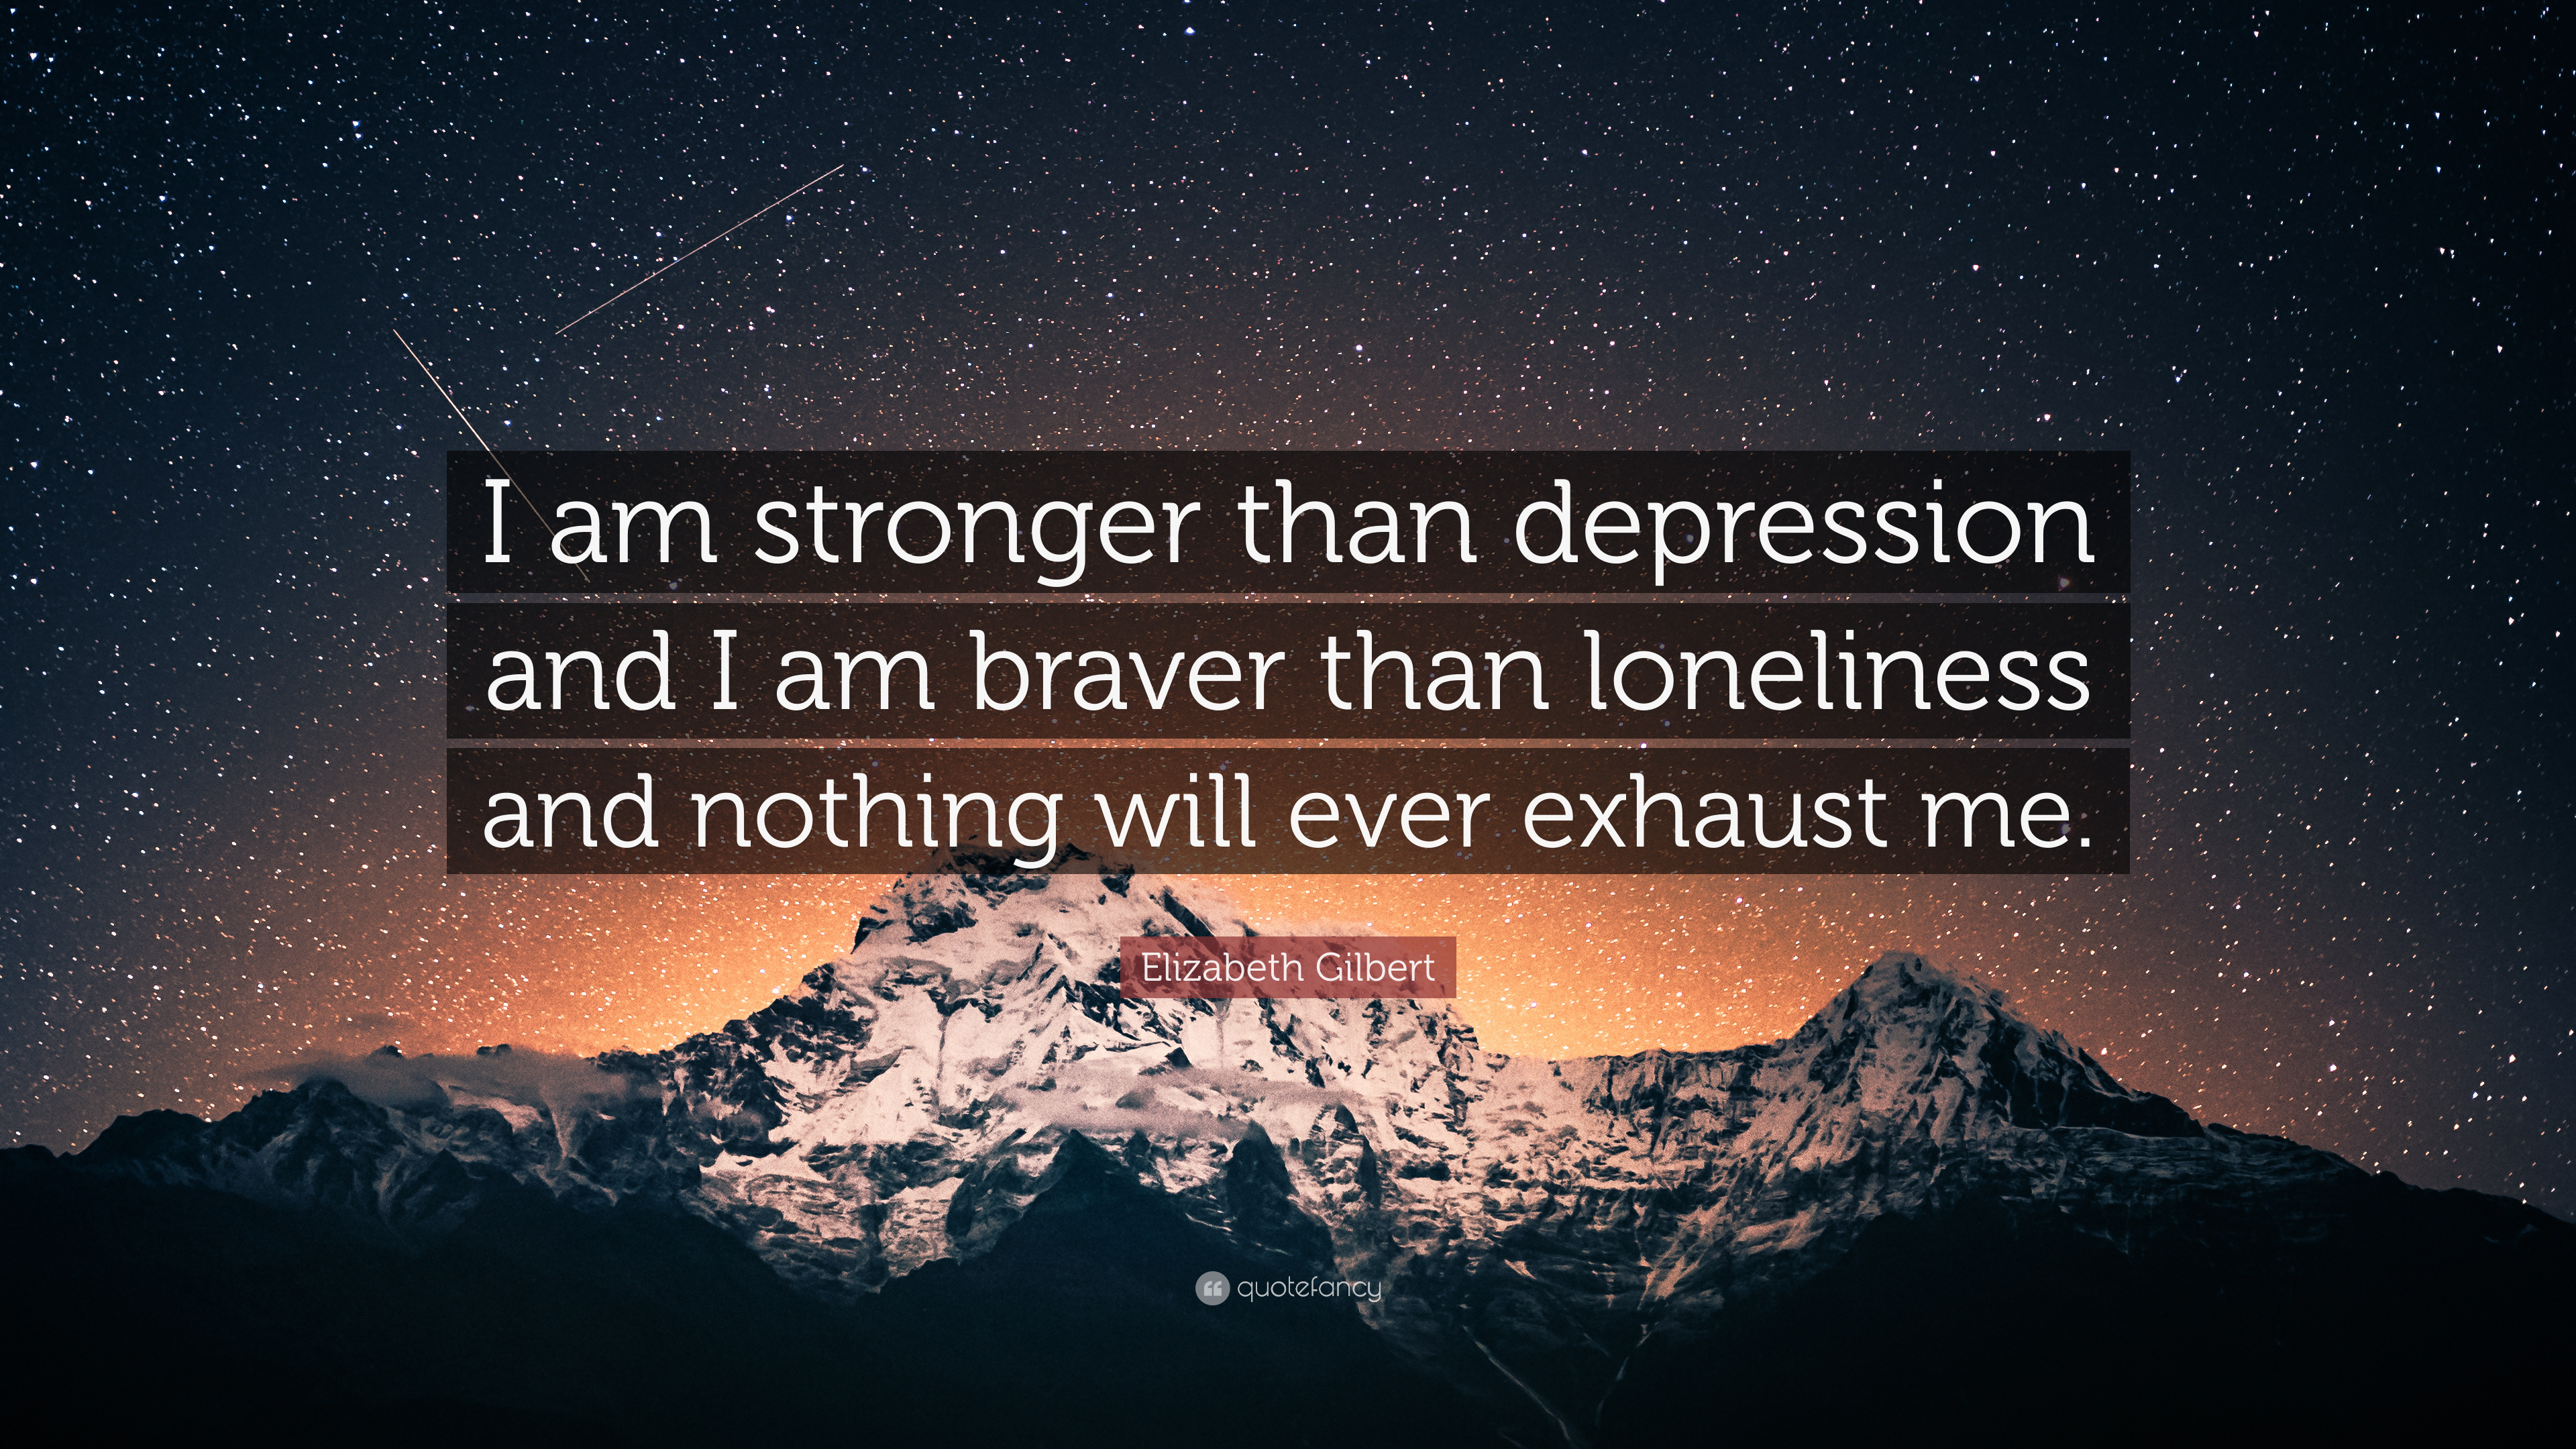 i am stronger than depression